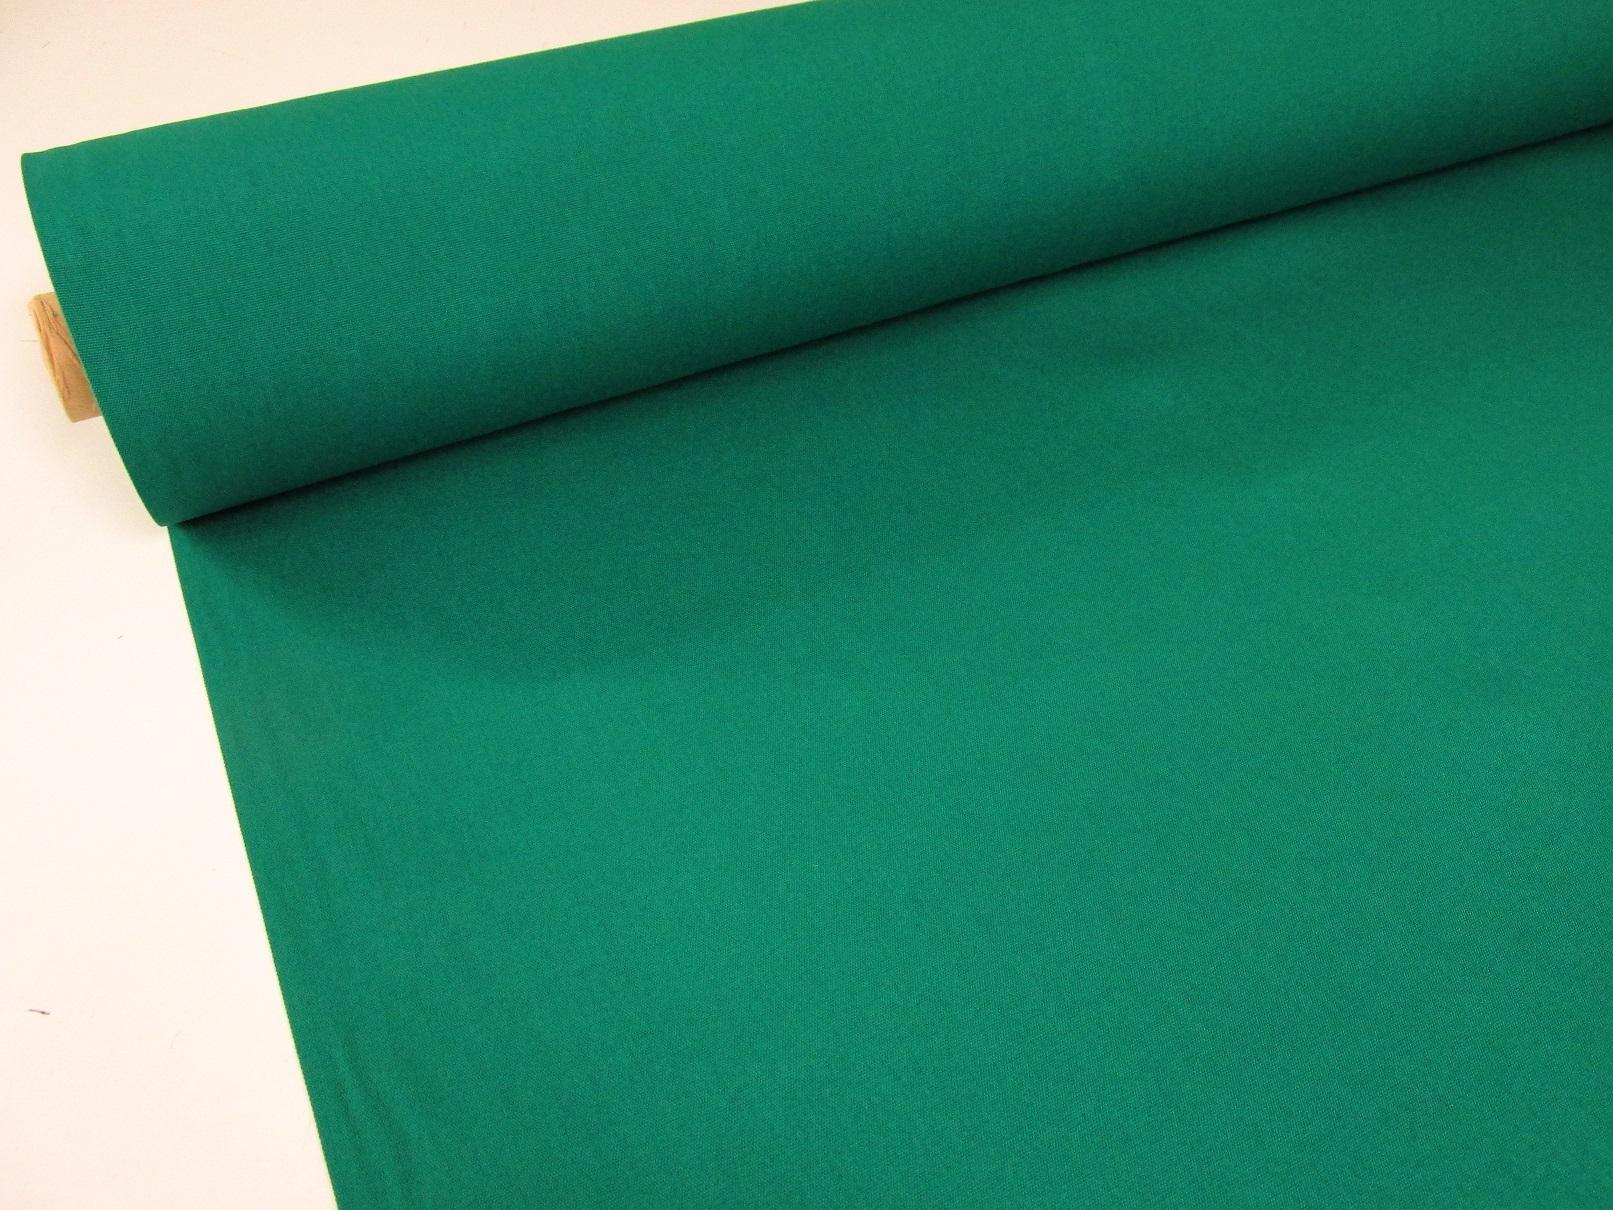 Metraje tejido lona toldo acrilica x metros ancho de for Lona de toldo por metros